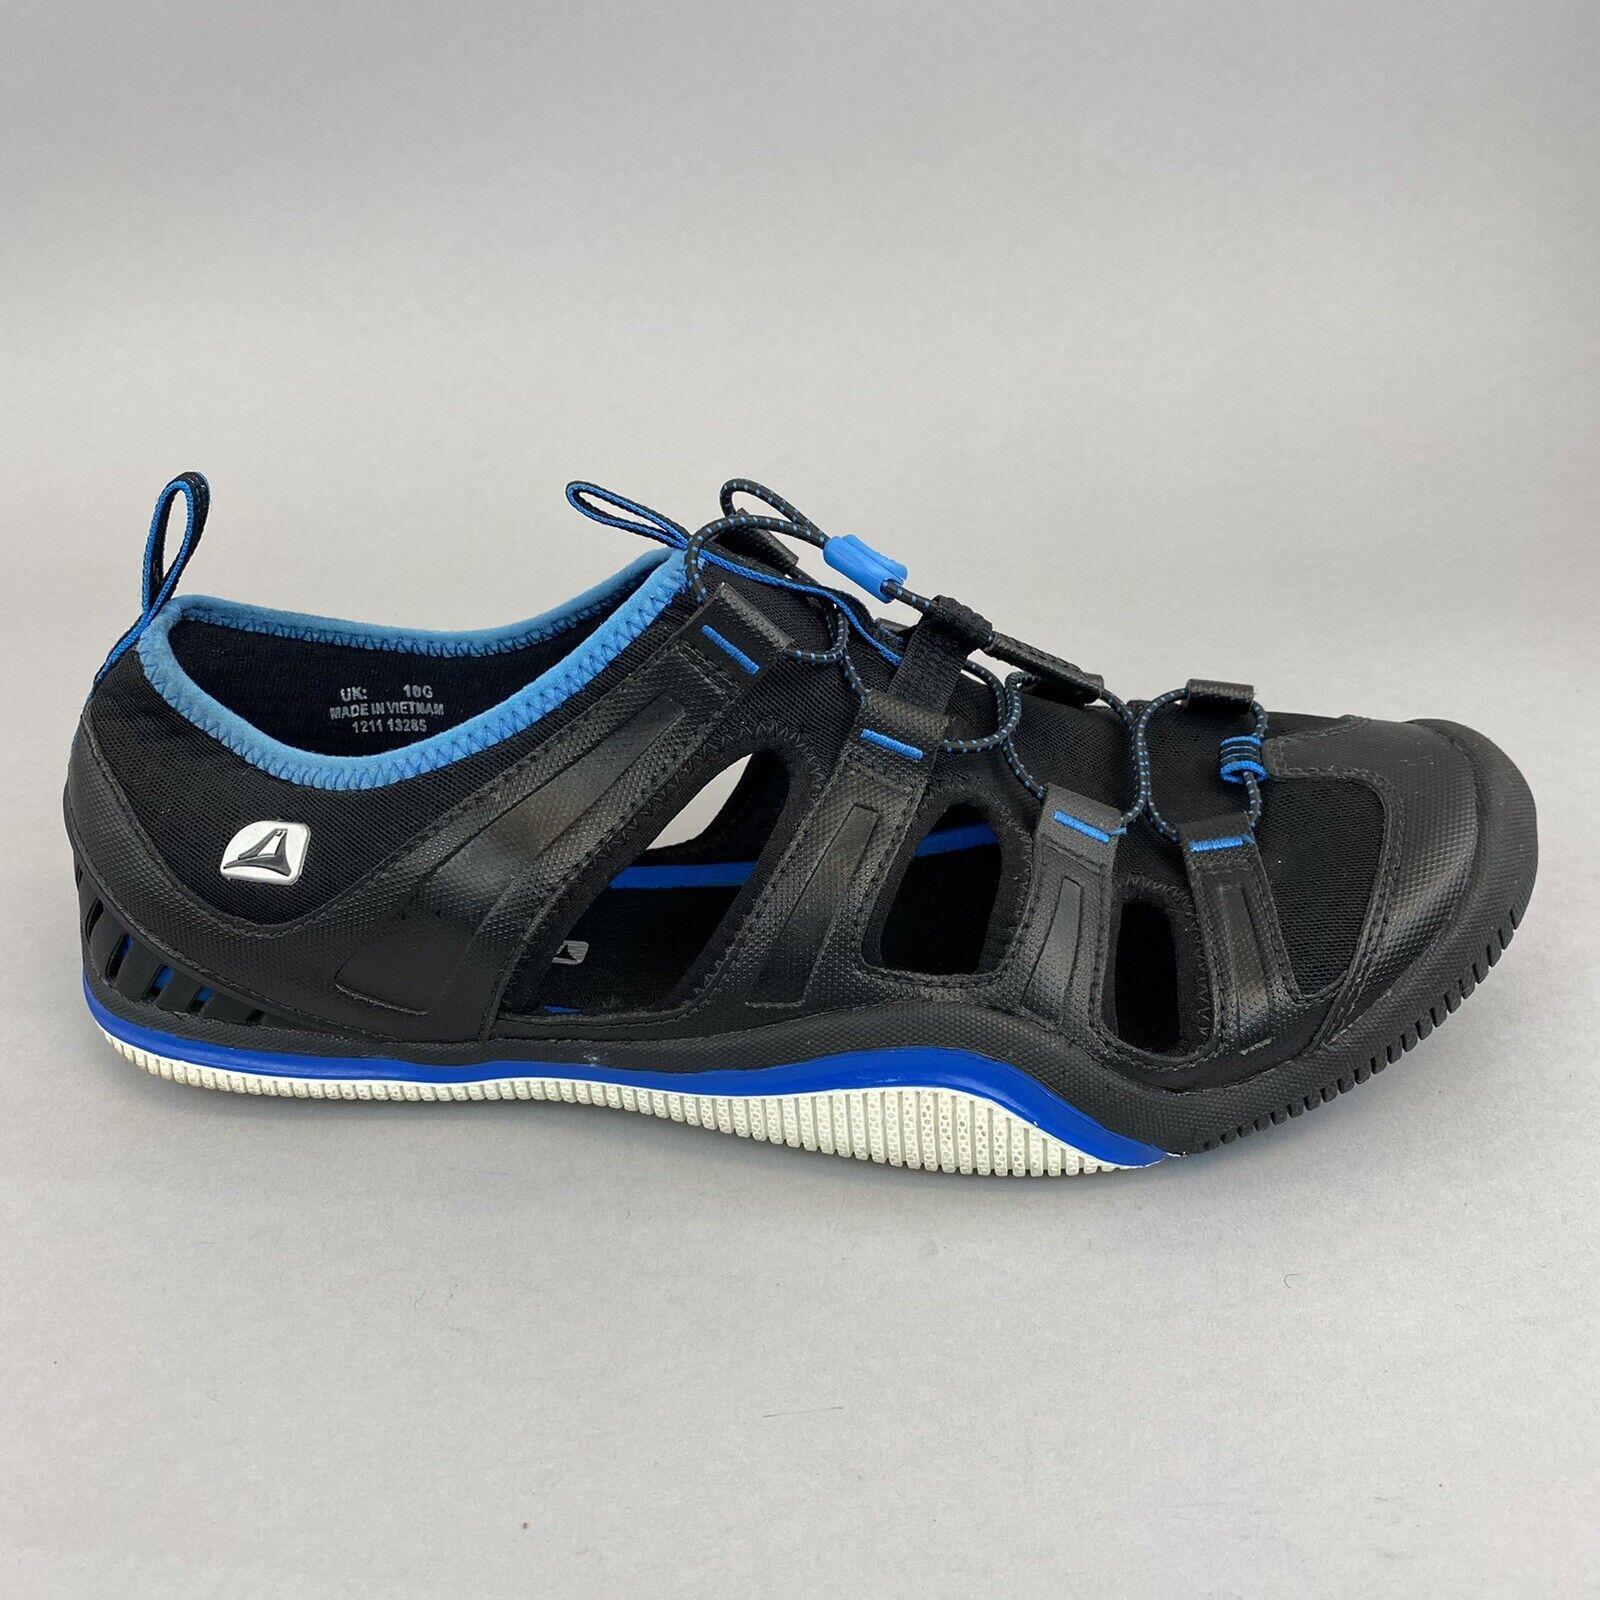 CLARKS ROCK Black Blue Walking Summer Holiday Beach Camping Sandals Shoes UK10 G